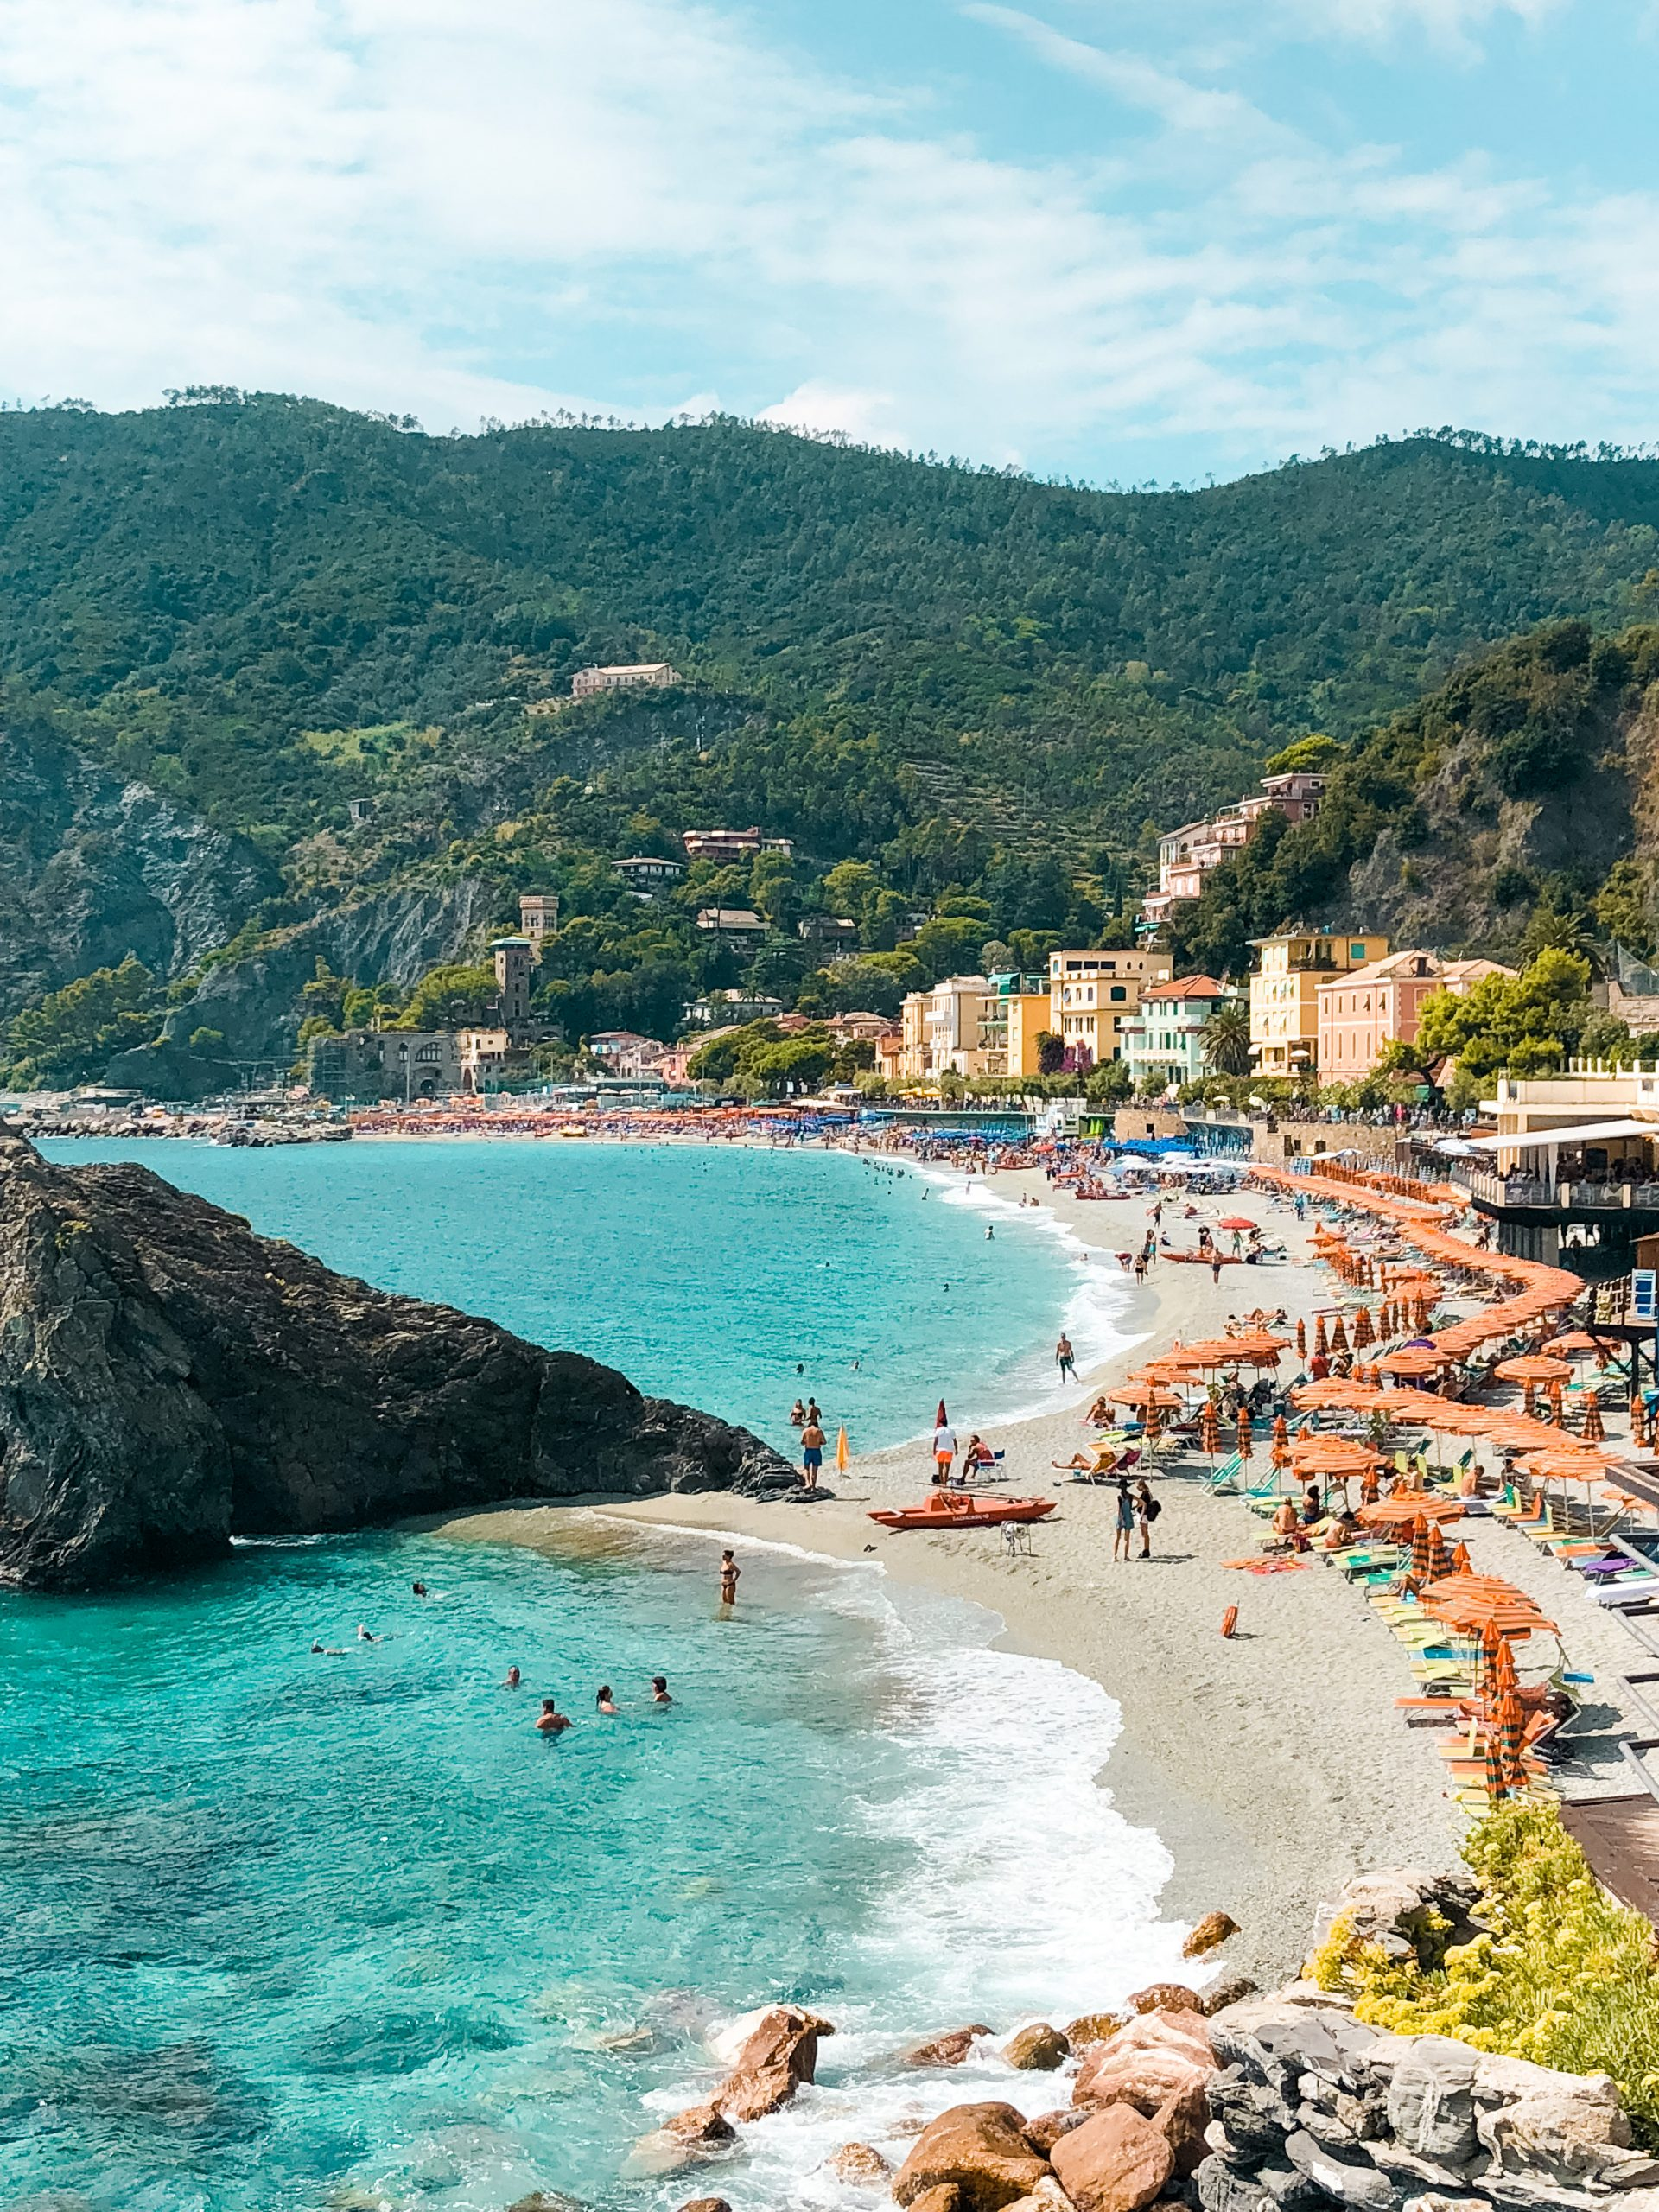 beachside lined with orange umbrellas on Monterreso